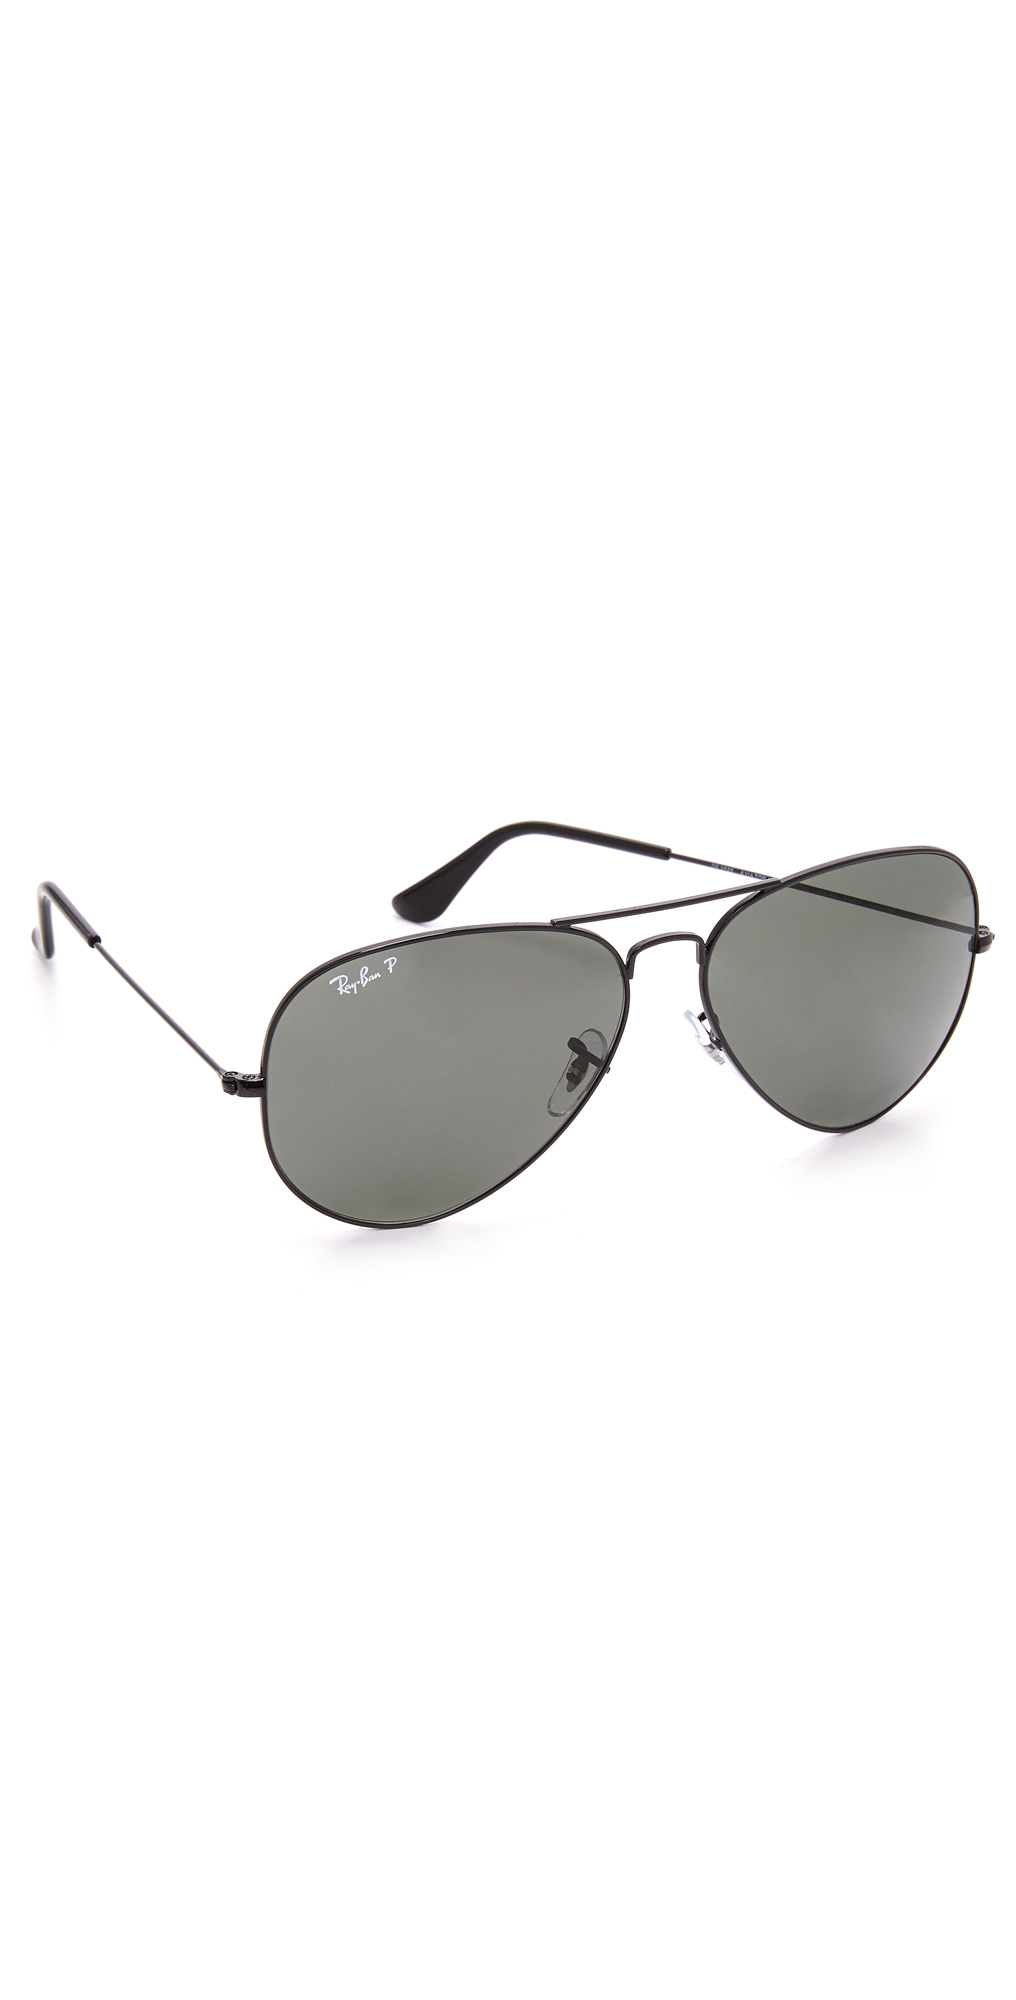 Oversized Polarized Aviator Sunglasses Ray-Ban